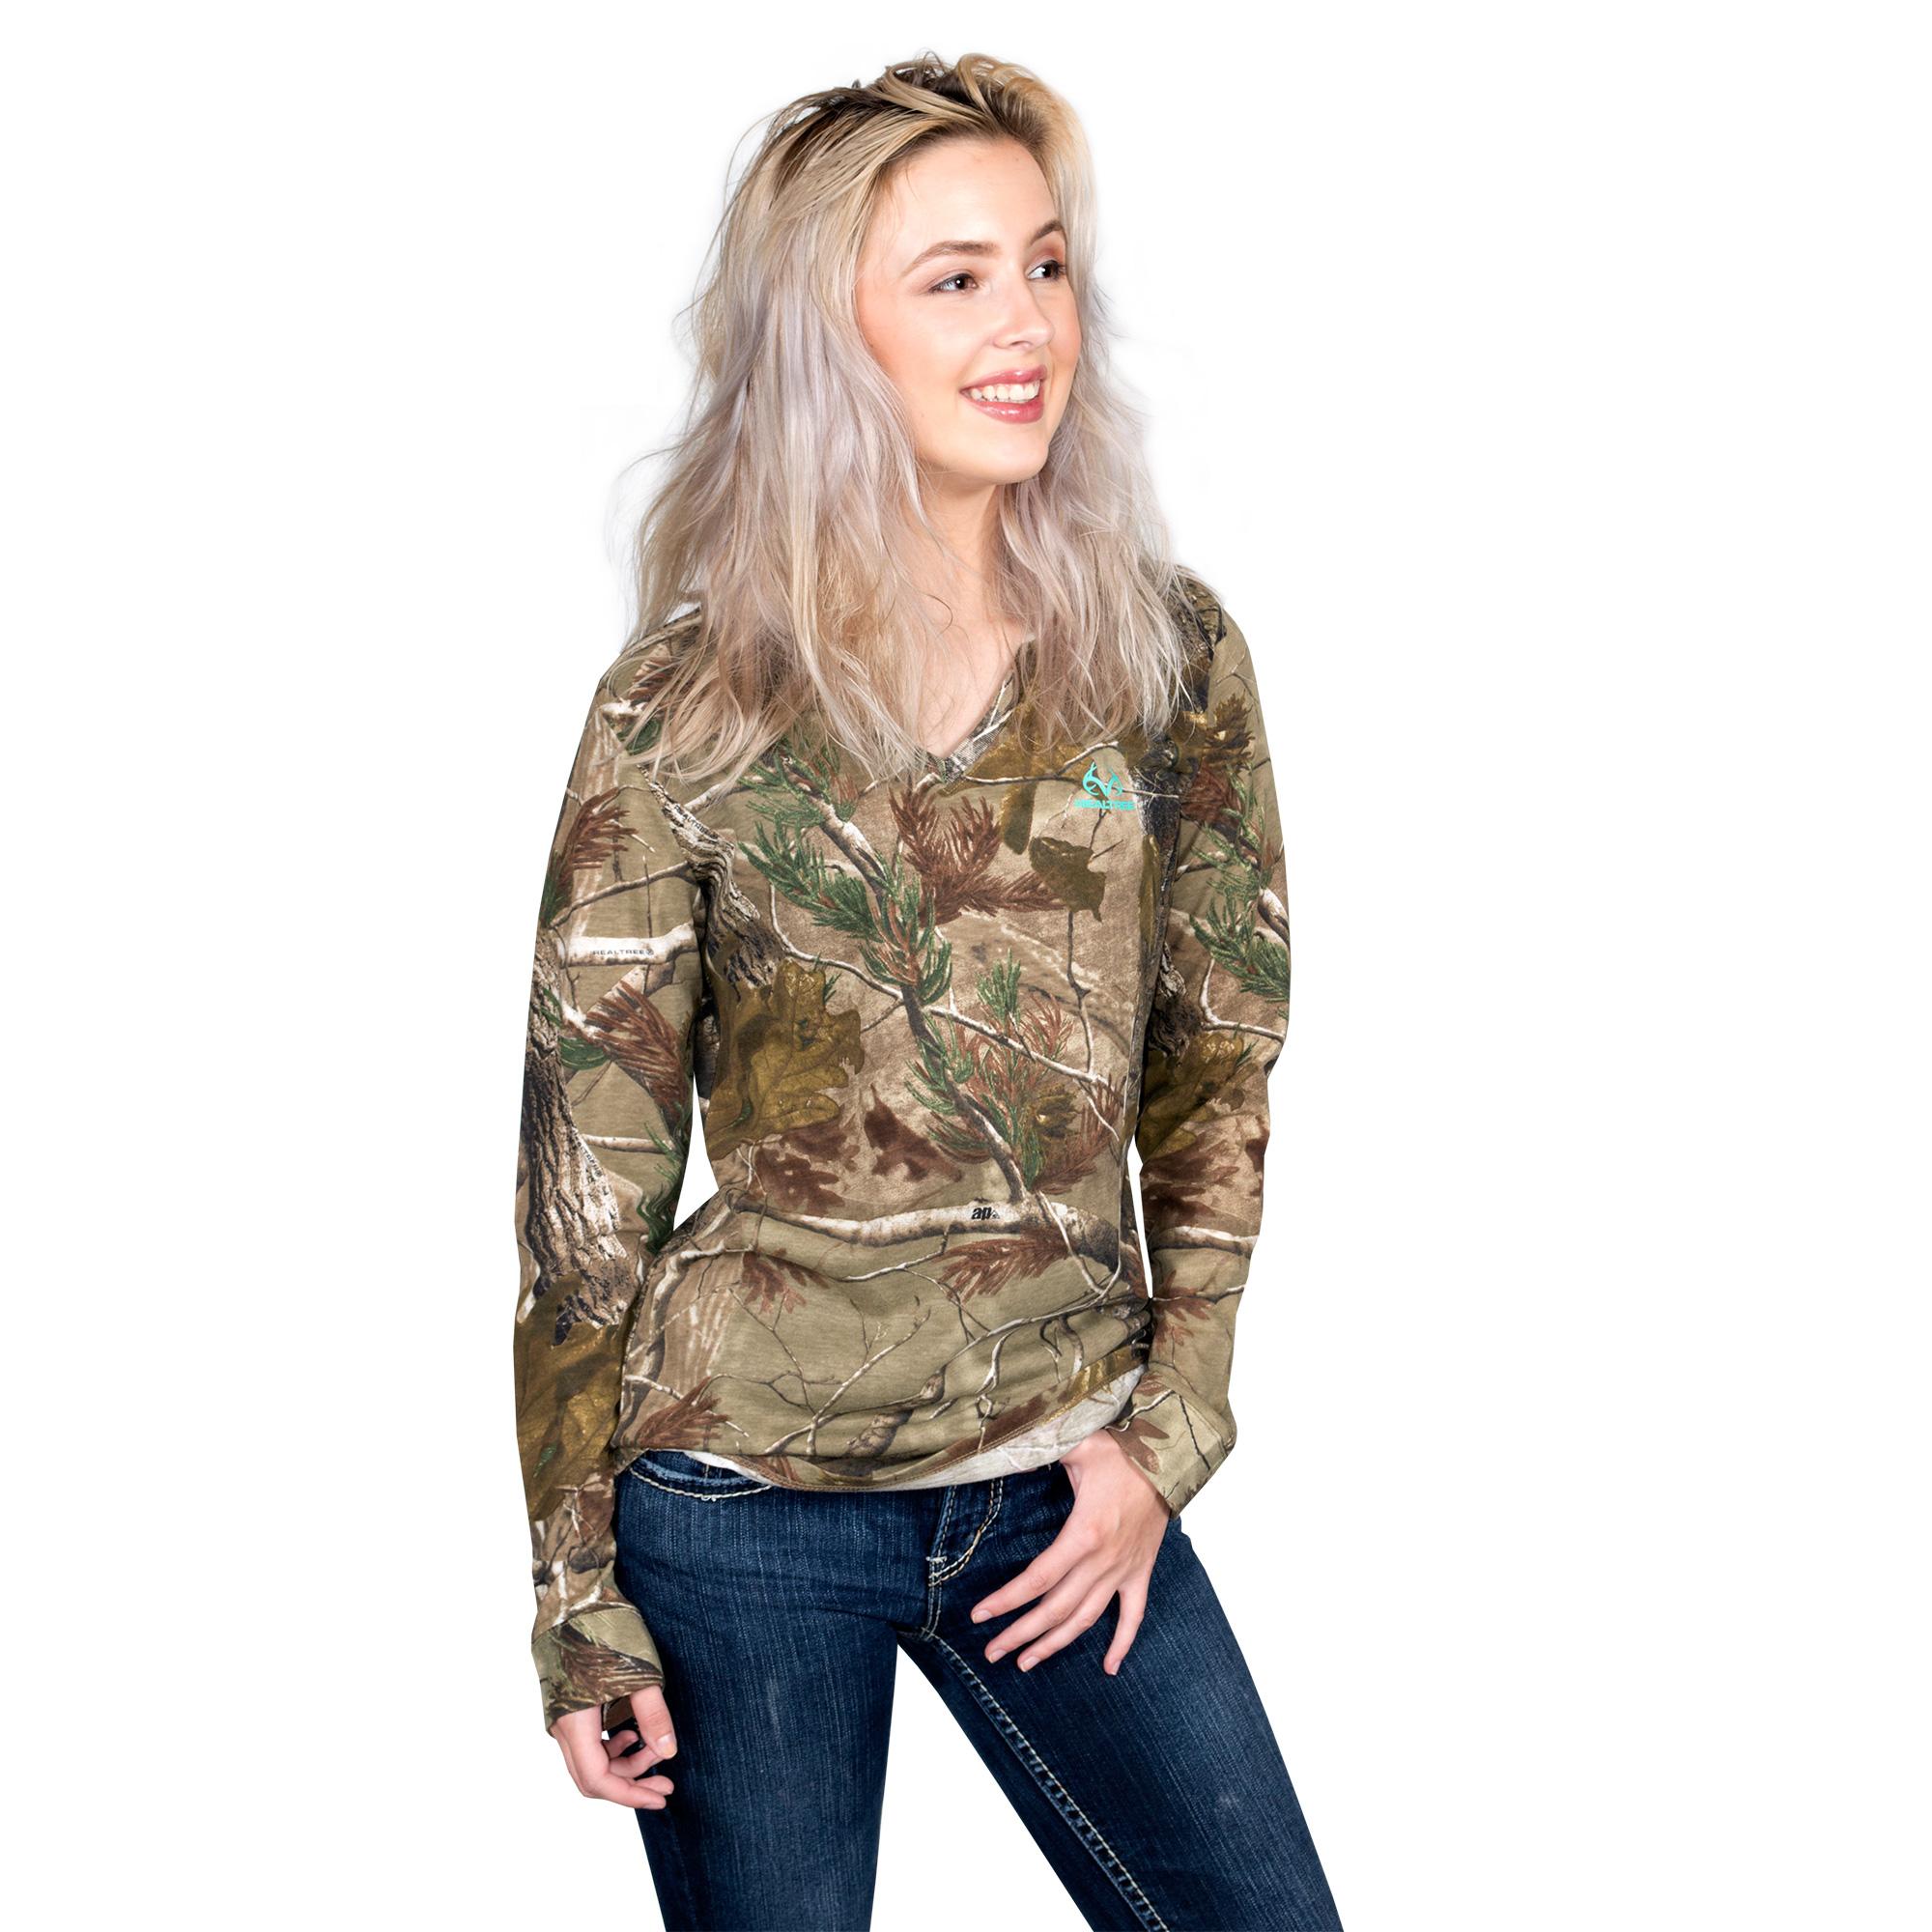 Ladies Long Sleeve Camo Shirt - Realtree